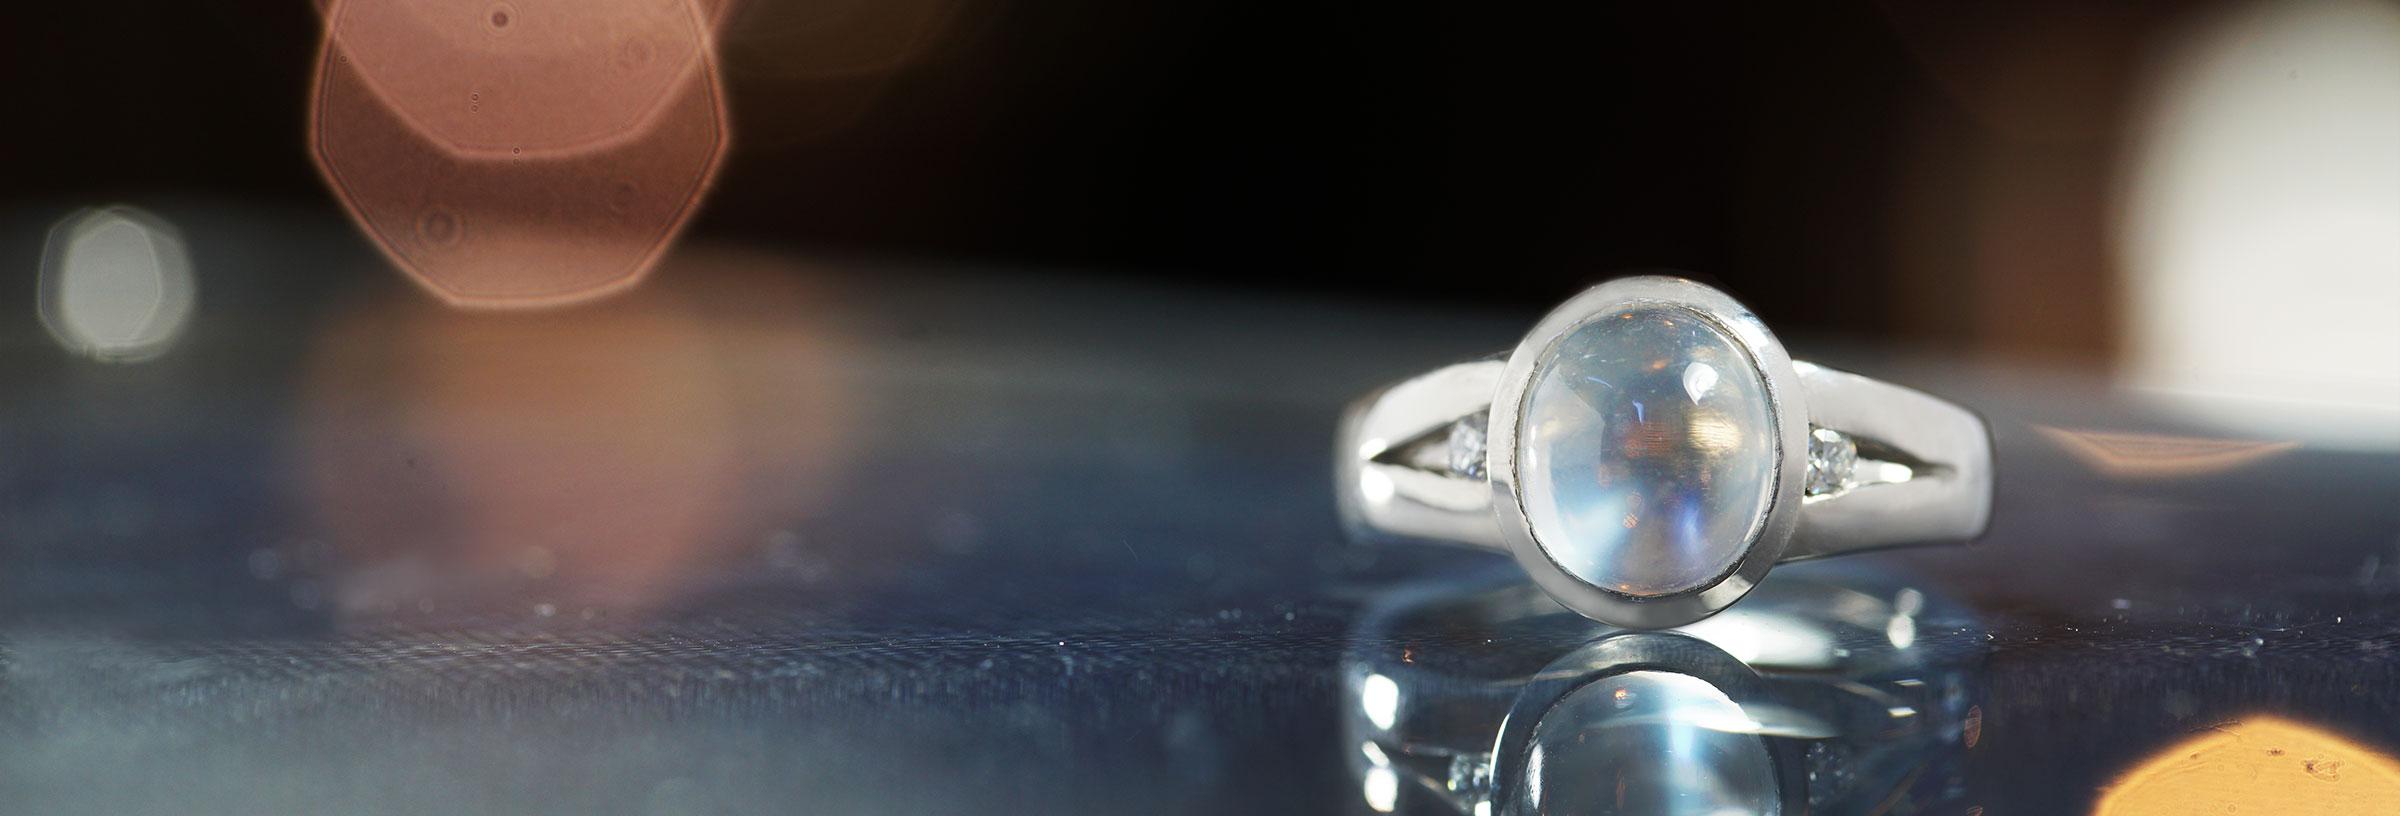 palladium-cabochon-cut-moonstone-and-diamond-split-shoulder-engagement-ring